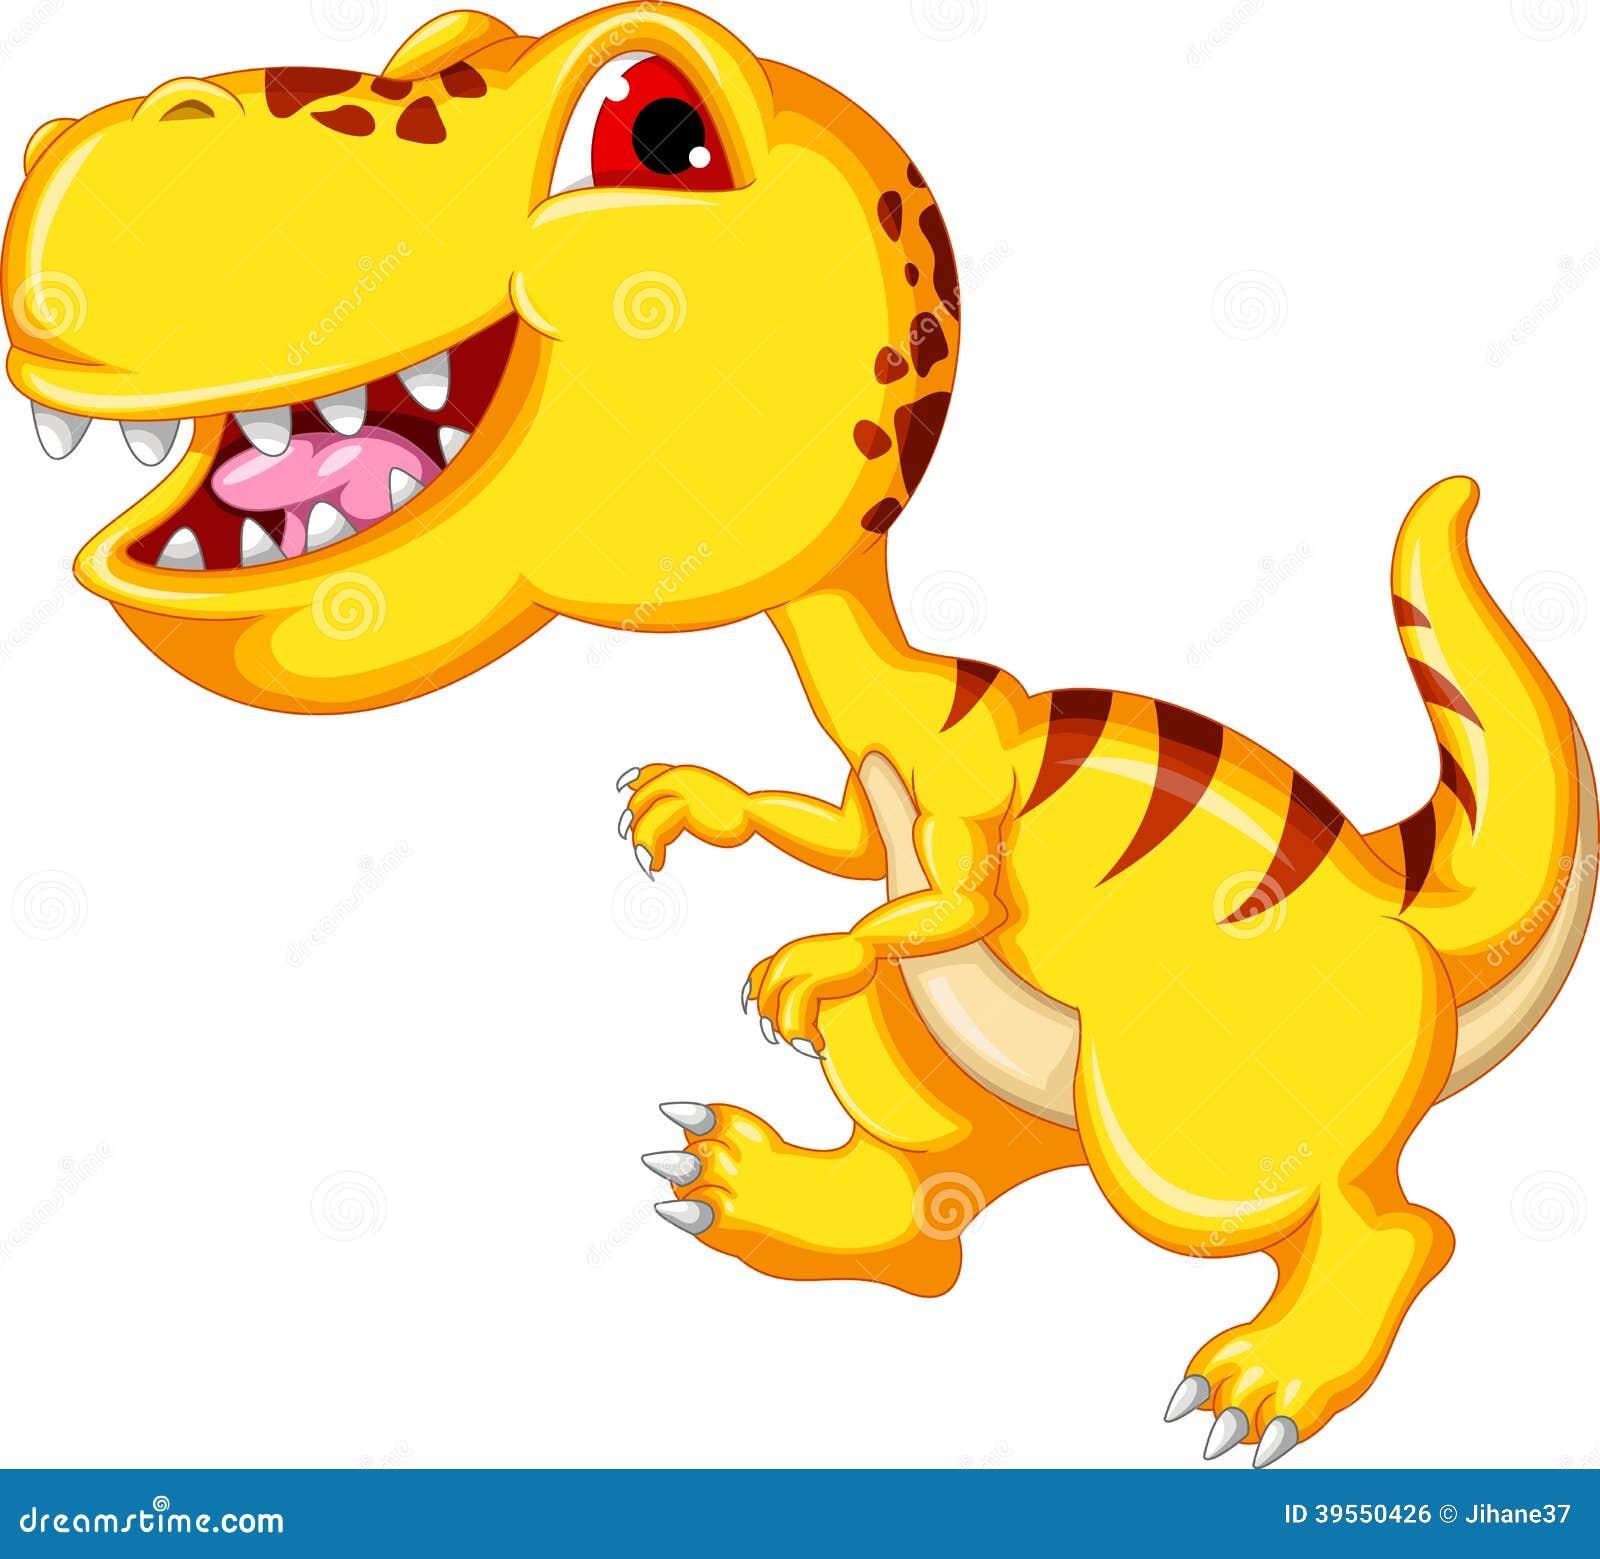 dinosaur cartoon isolated stock illustration illustration cute dinosaur clipart black and white cute dinosaur clipart black and white